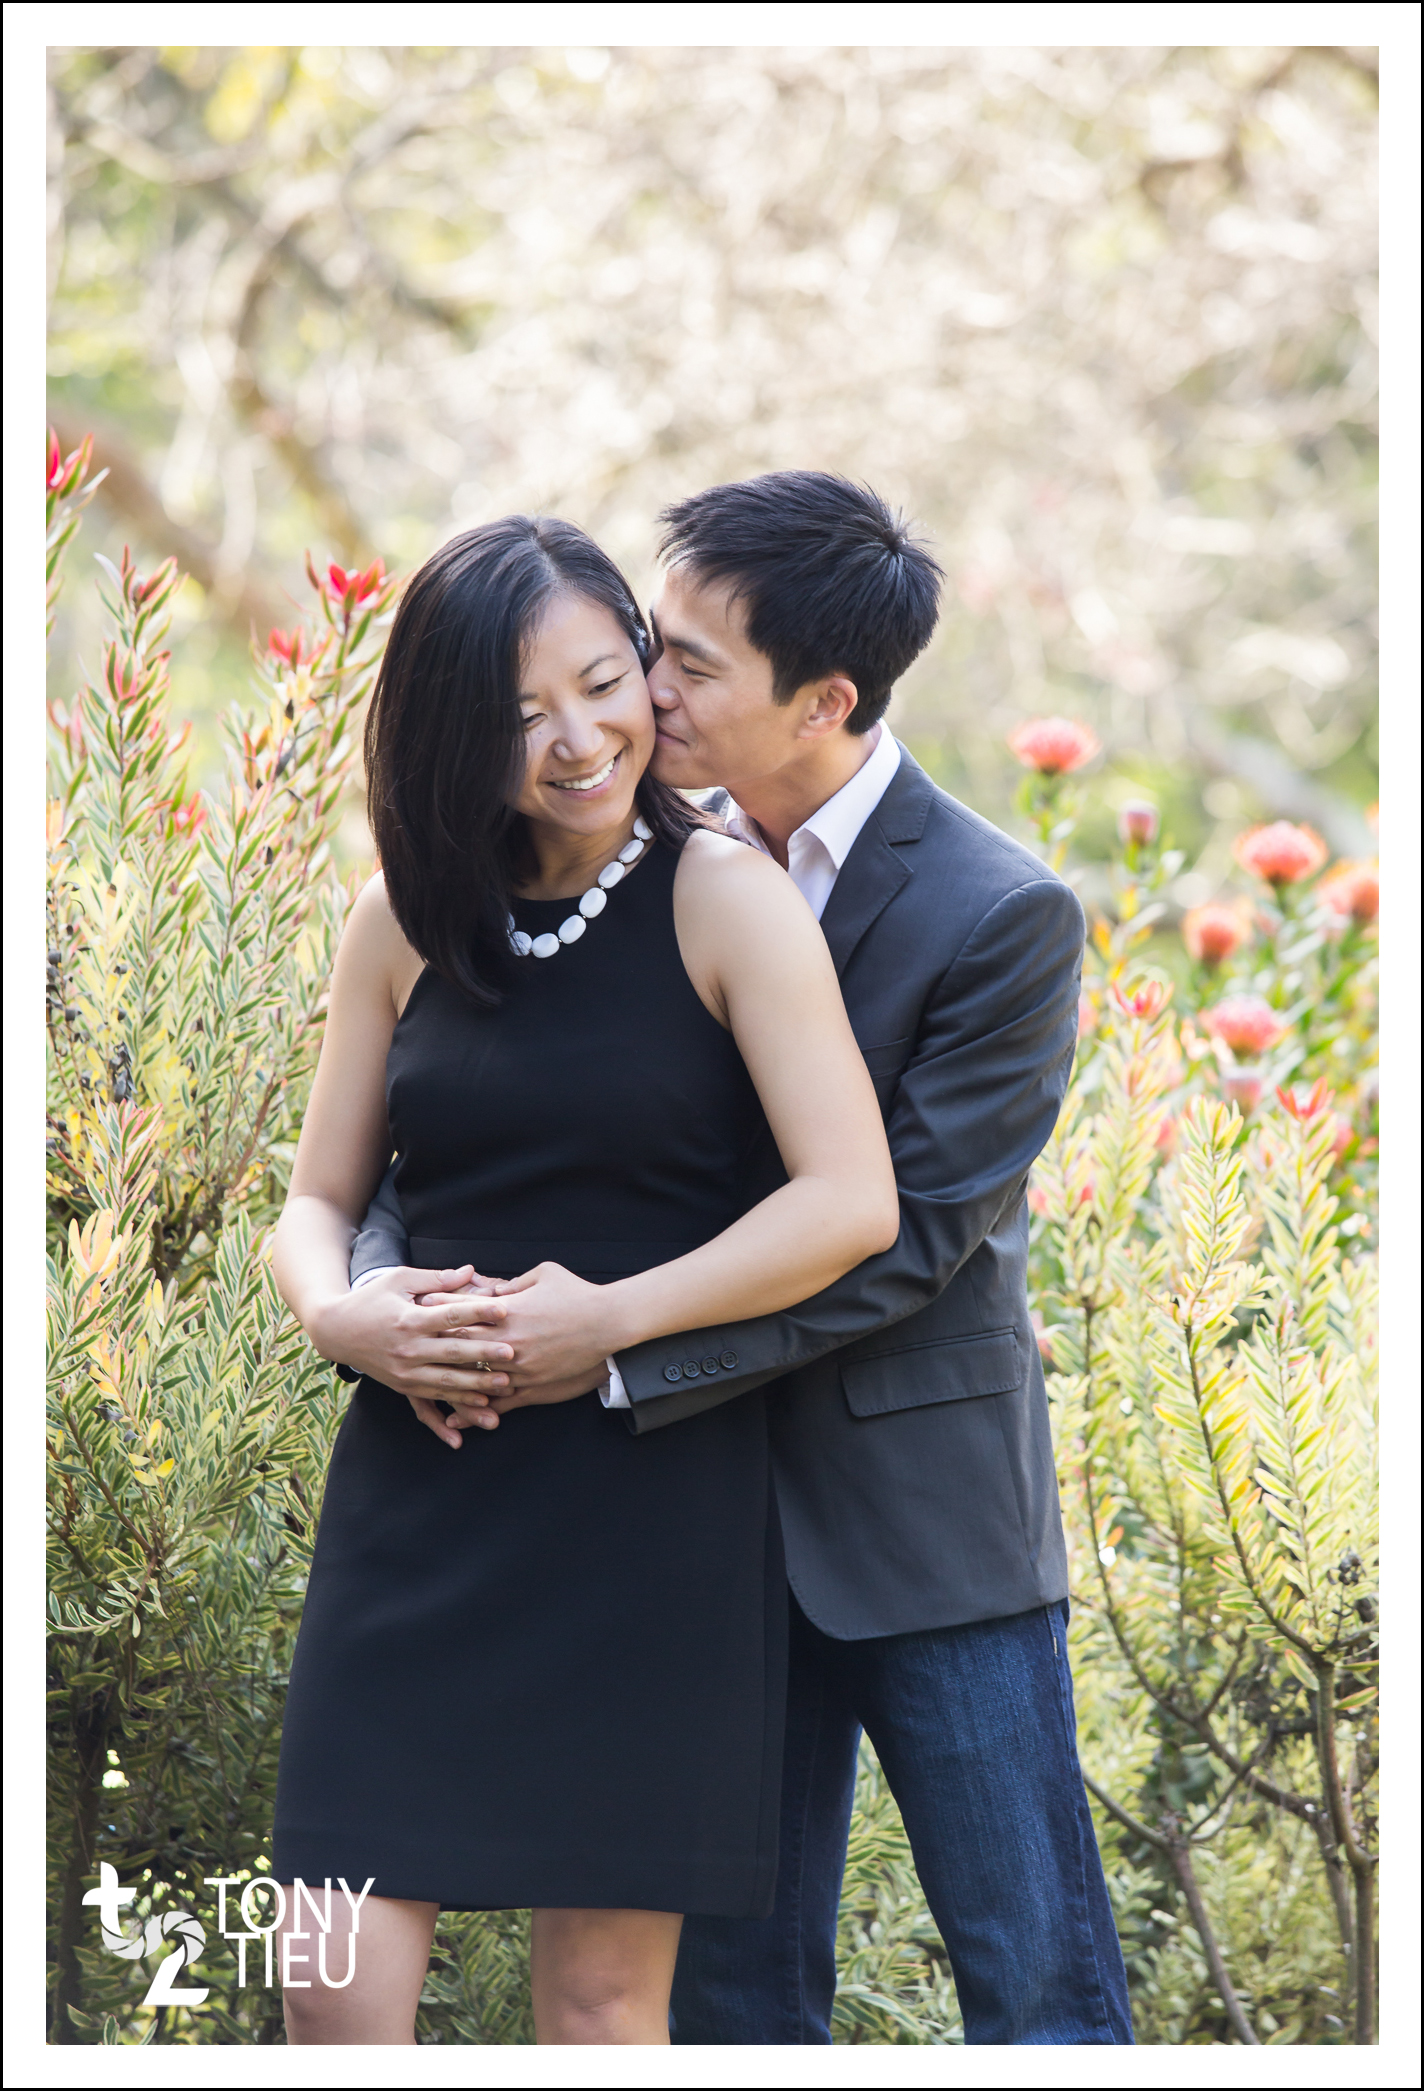 Tony_Tieu_Yang Jimmy_Engagement_